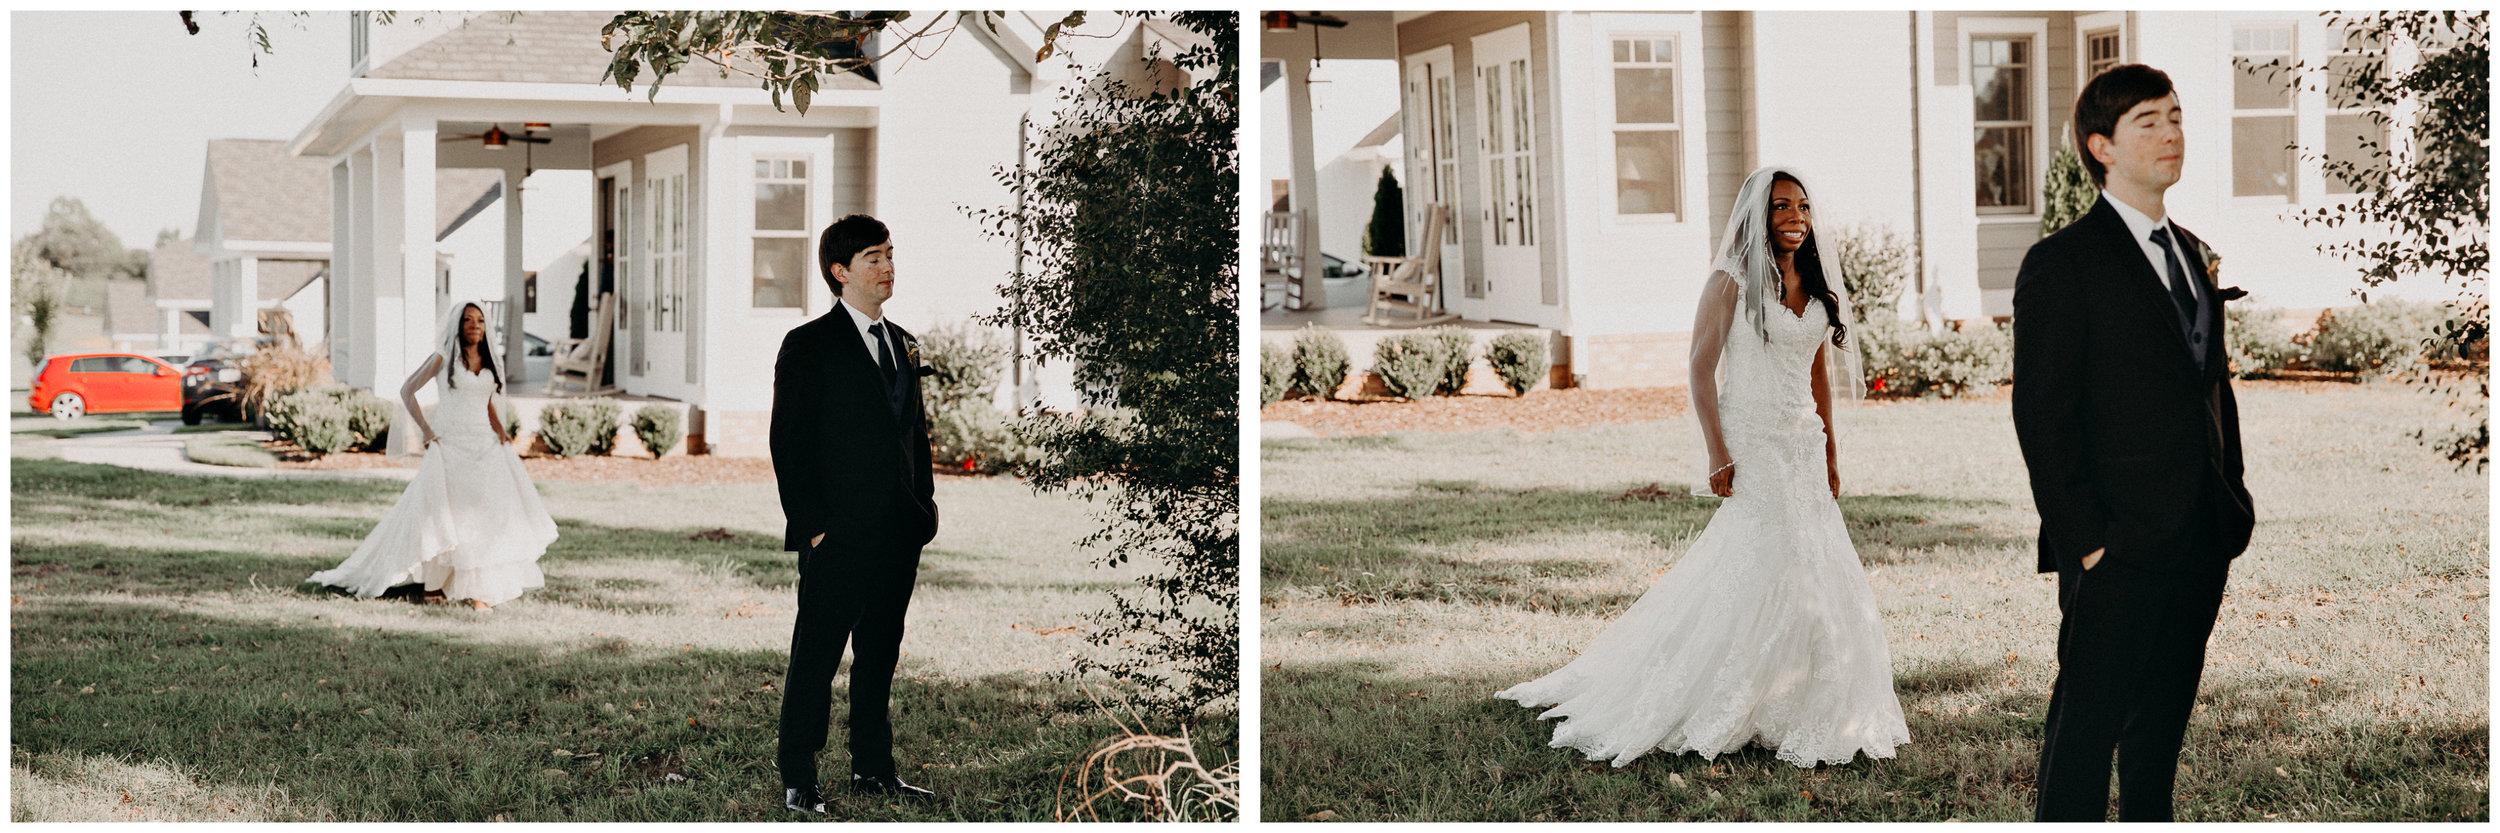 31- Wedding_day_atlanta_georgia_Bride_and_groom_first_look_and_portraits_aline_marin_photography.jpg